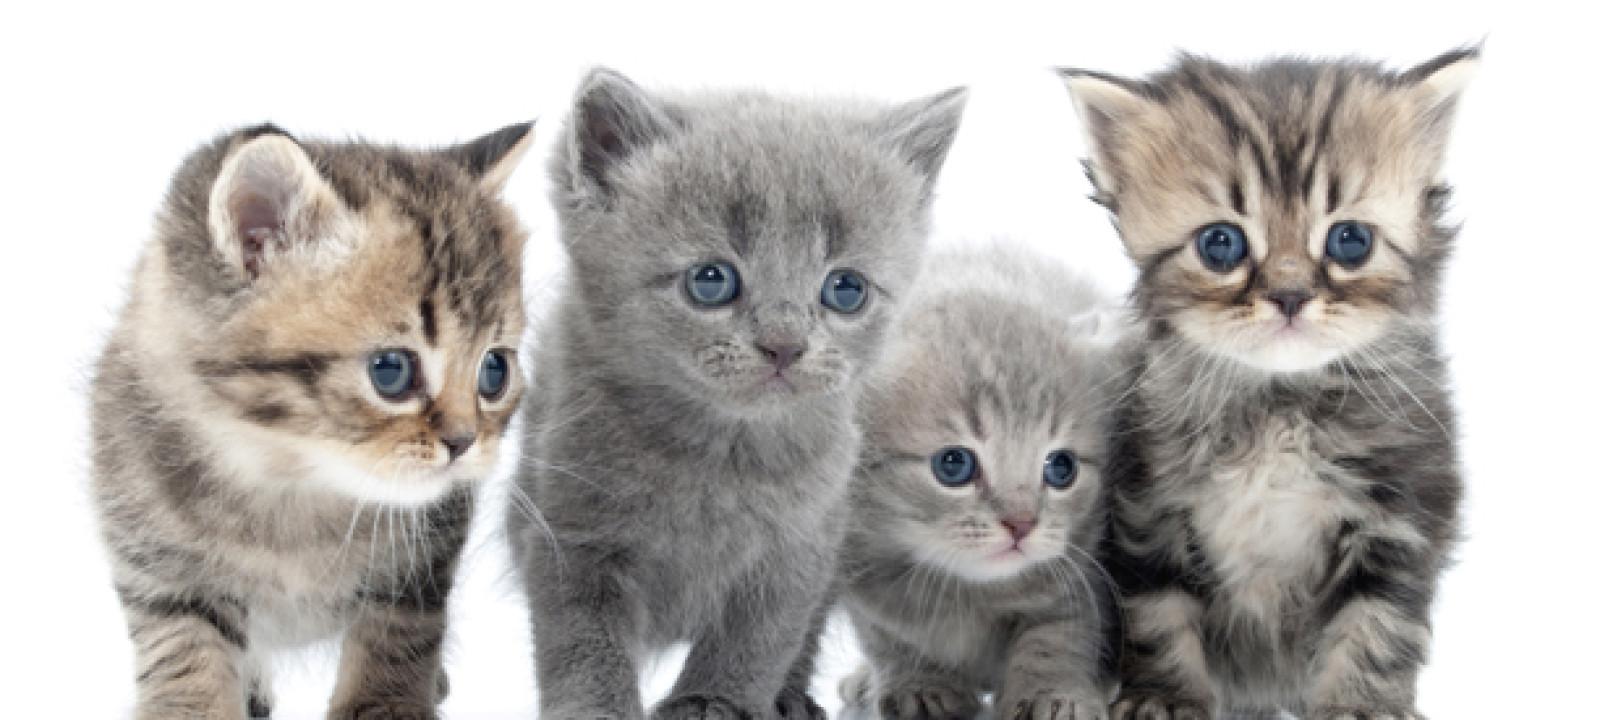 612x344_kittens